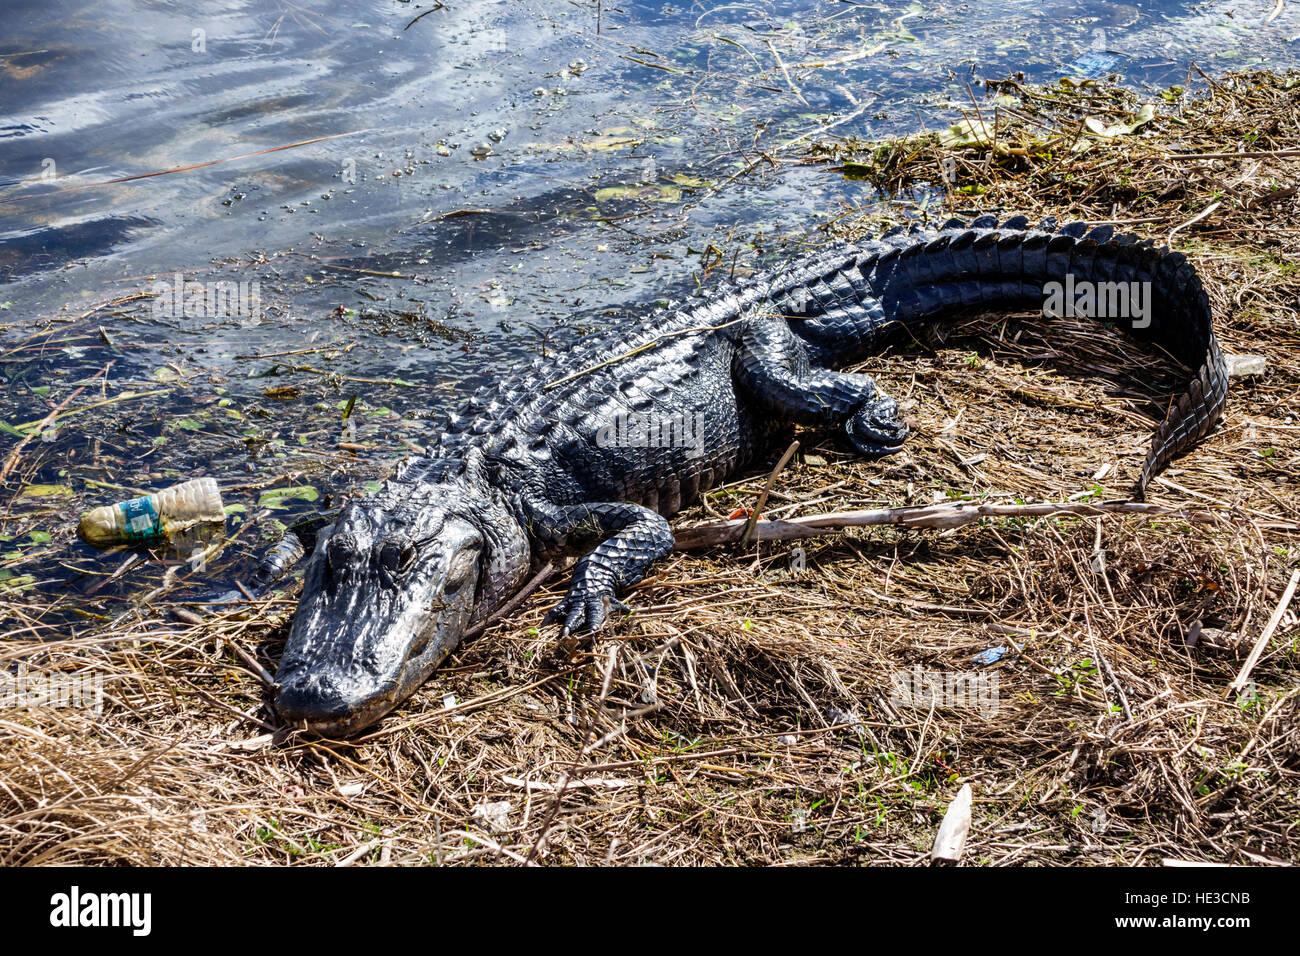 Everglades Florida Alligator Alley American alligator Alligator mississippiensis resting sunning plastic bottle Stock Photo